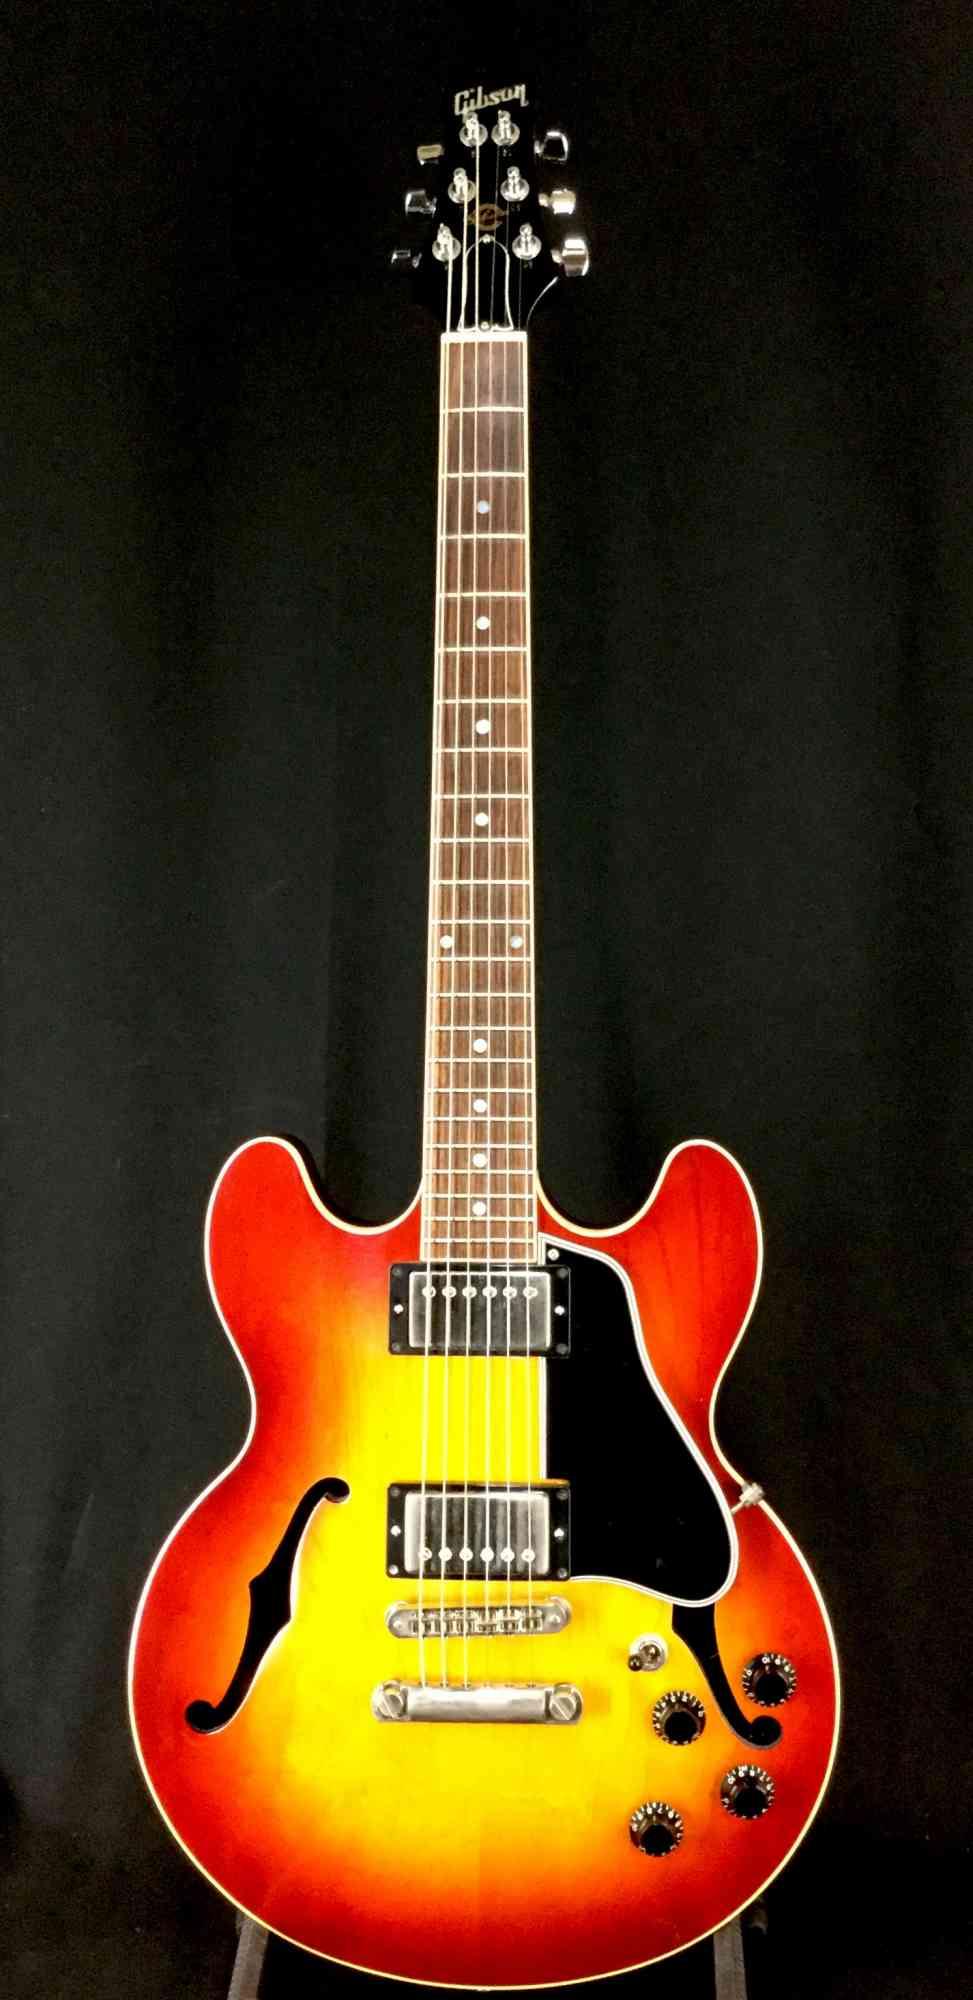 Gibson ES-336 1998 Sunburst. Click to enlarge